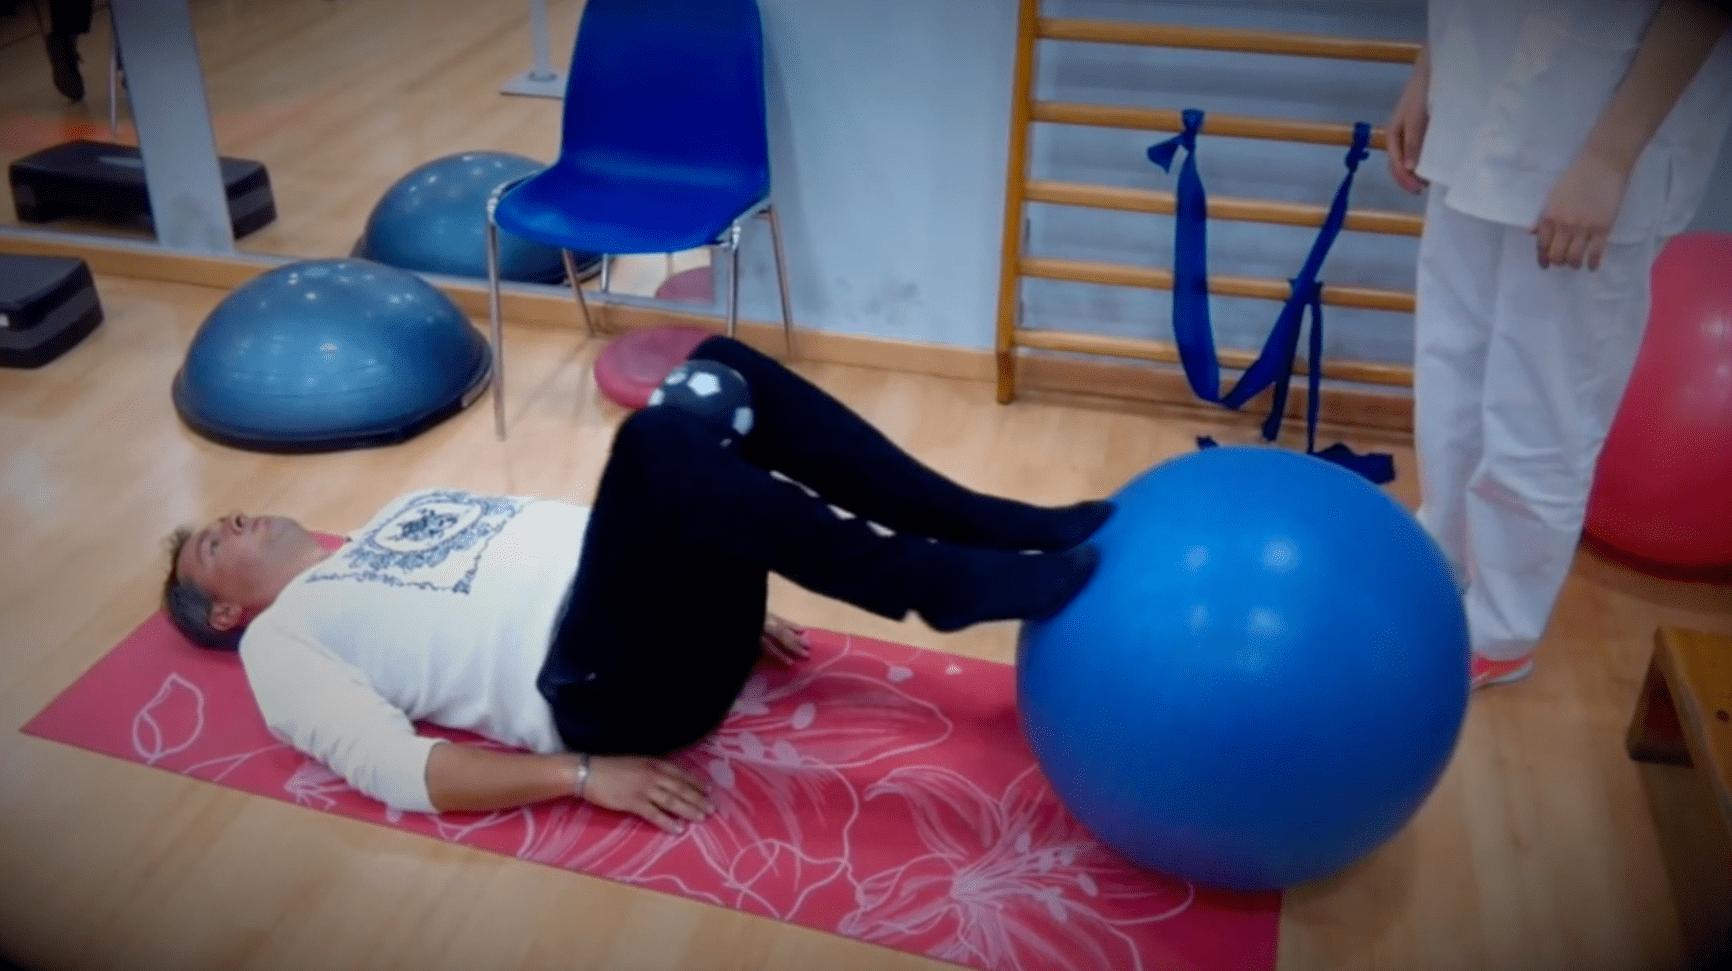 Ejercicios de estabilización lumbar Fisioterapia Enrique Sierra Fisioterapeuta Zaragoza